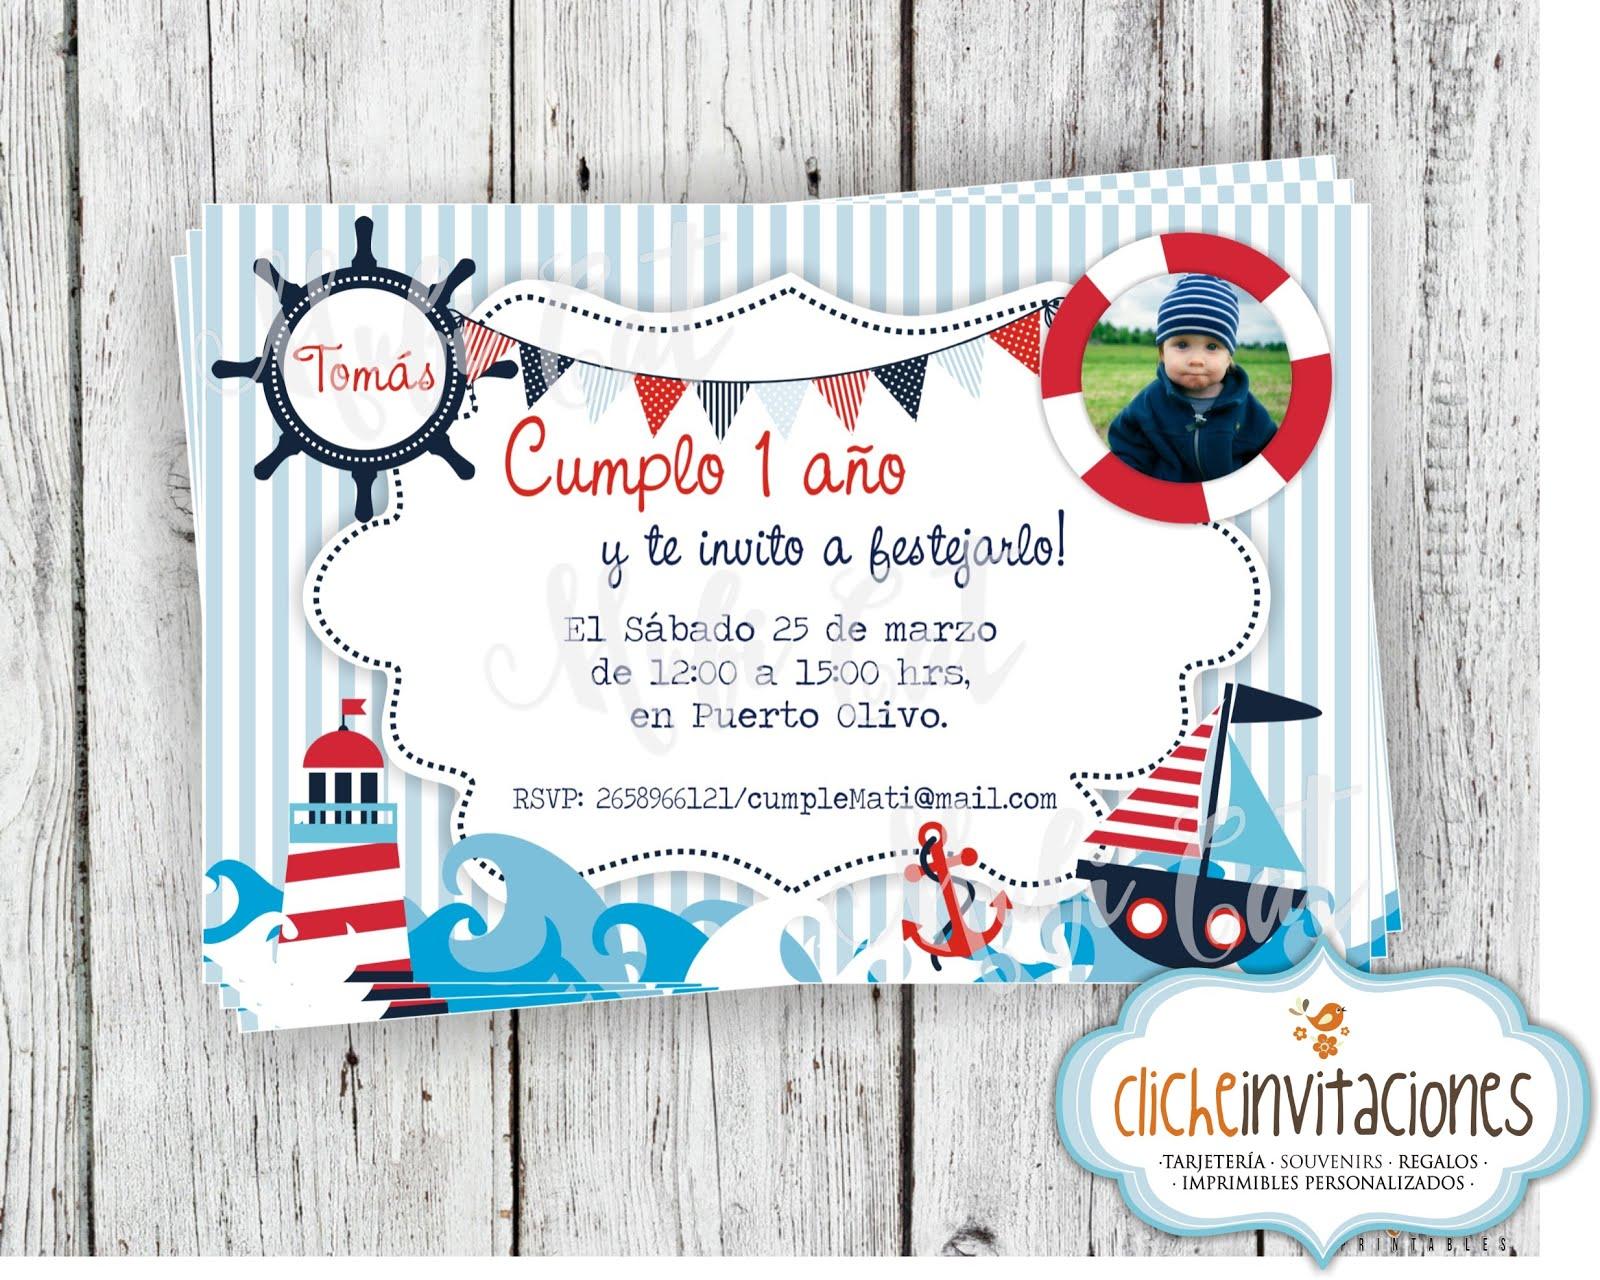 Cliche invitaciones tarjetas de cumplea os invitaciones - Tarjetas 50 cumpleanos ...